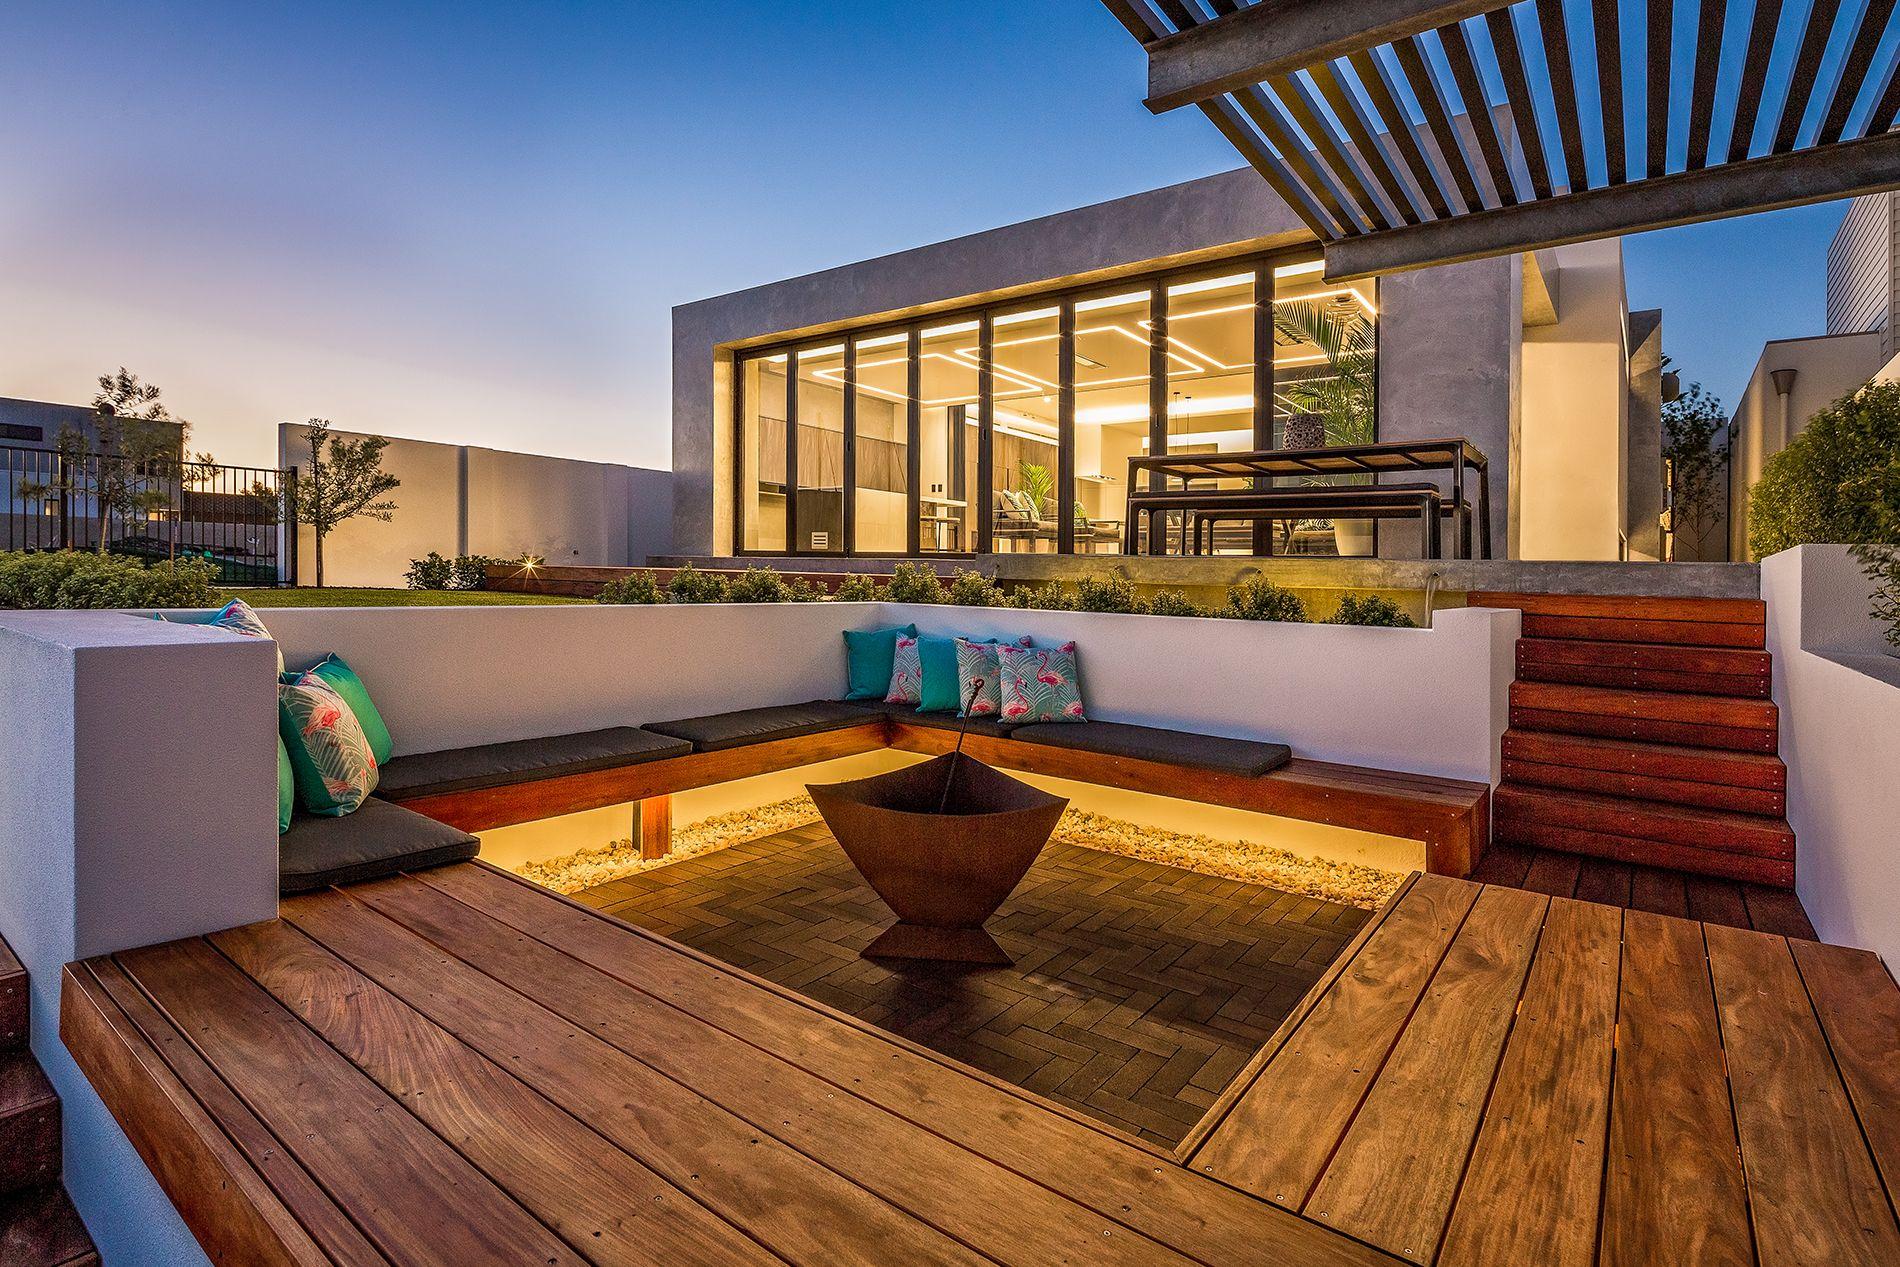 Design Services | Patio, Backyard design, Outdoor dining area on Platinum Outdoor Living id=81987